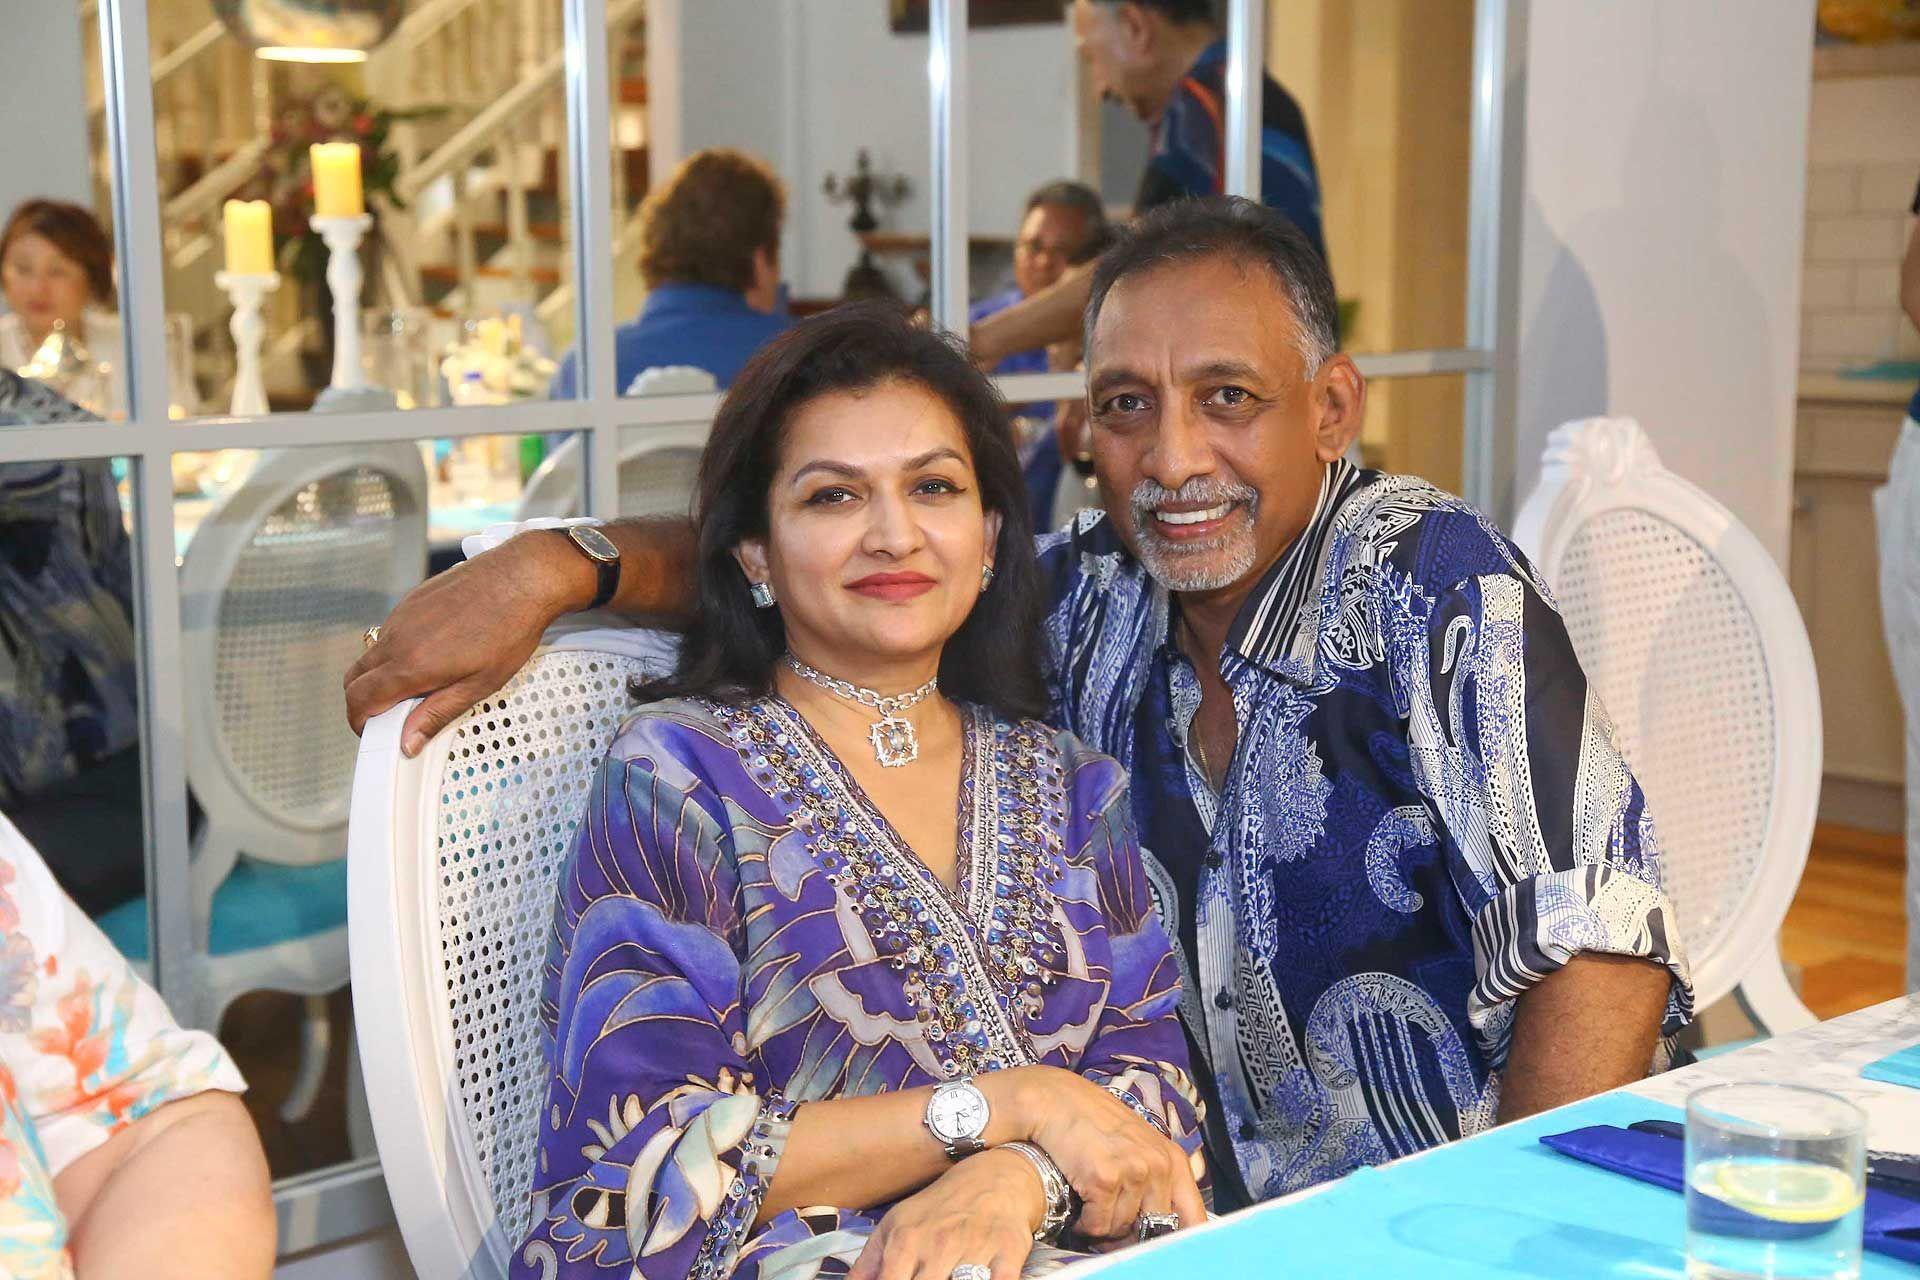 Datin Usha Nair and Dato' Mohan Karthigasu